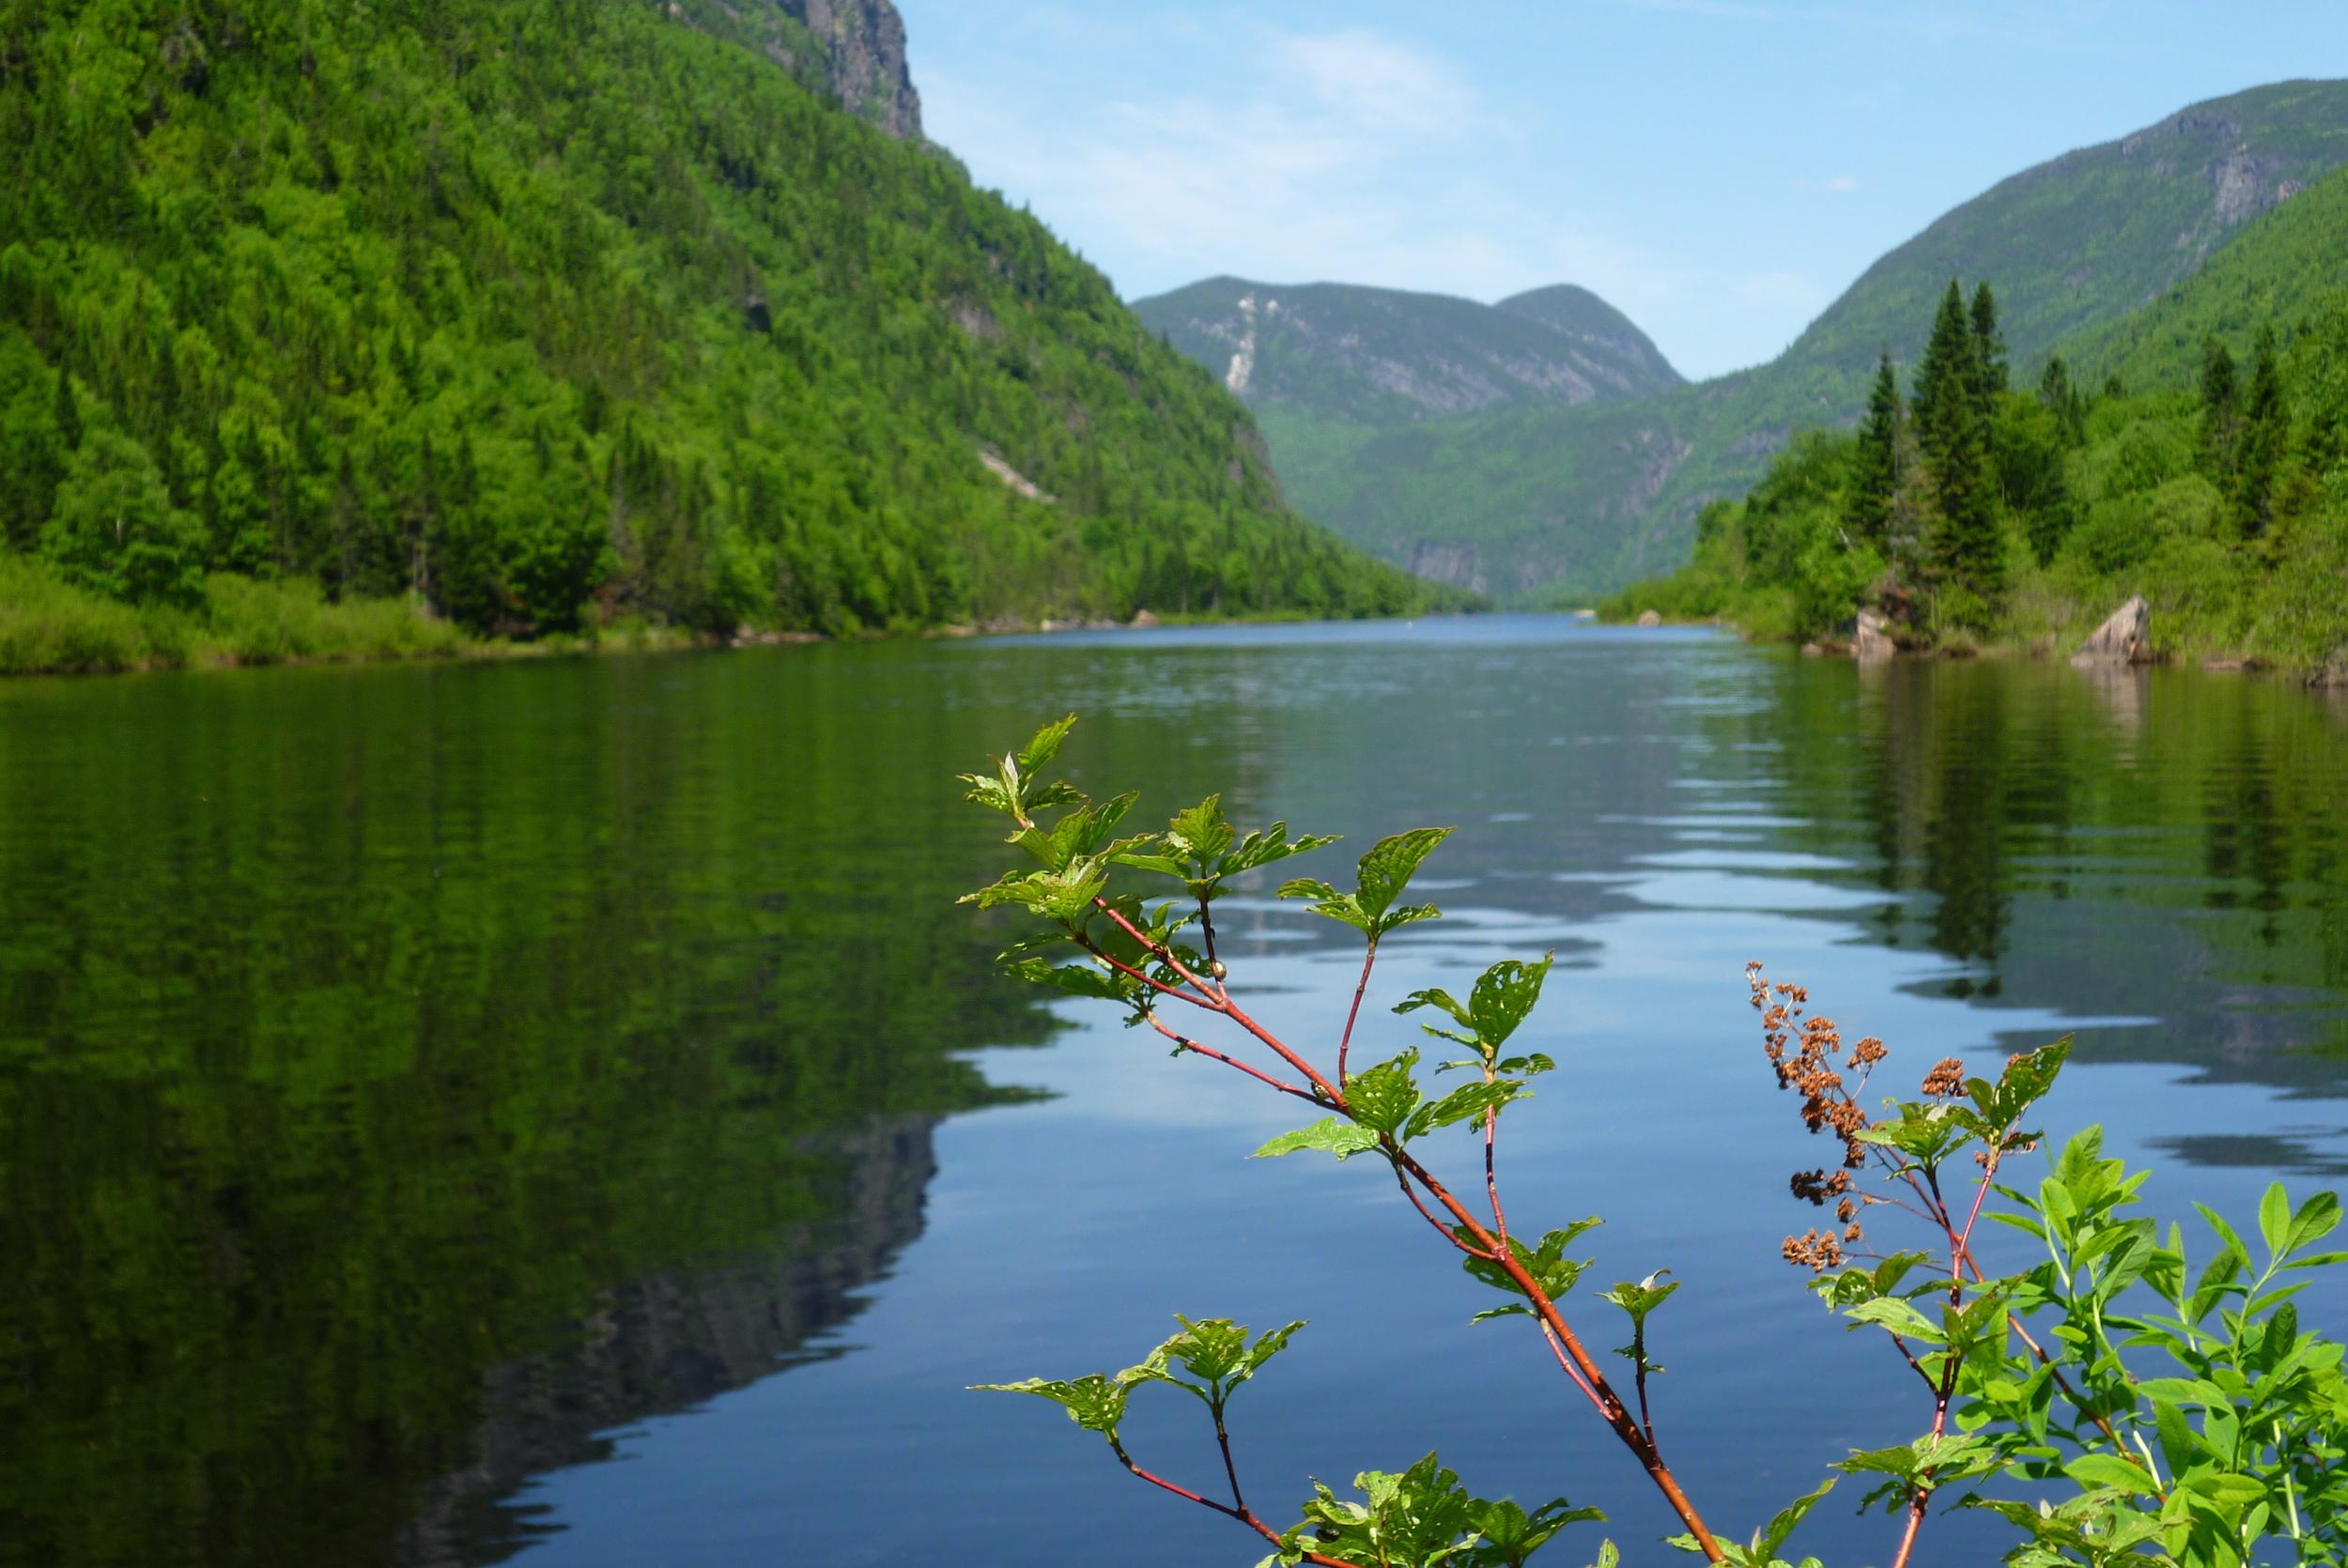 Acheter un van au Canada - Riviere Malbaie